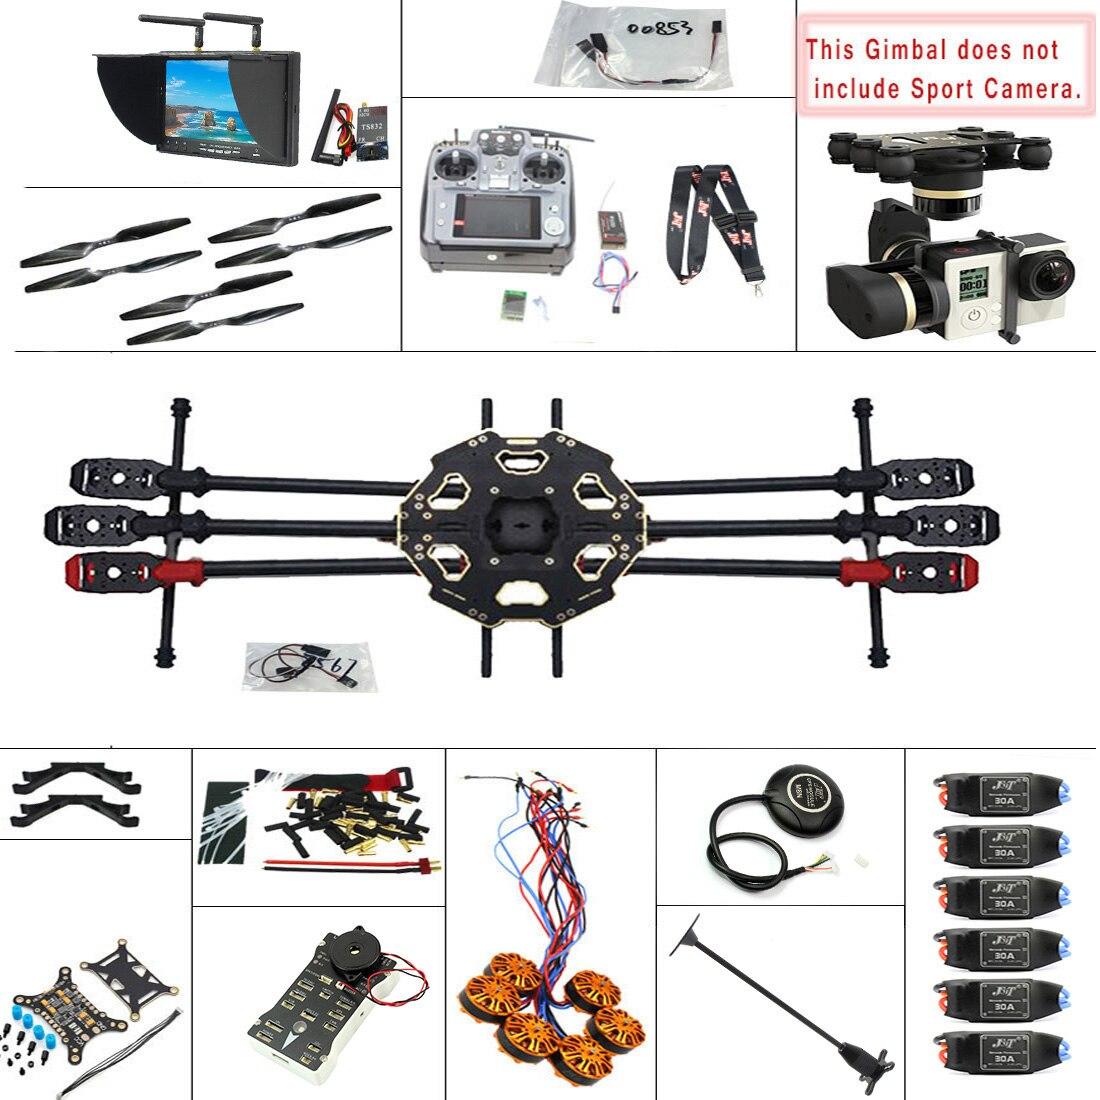 F07807 H JMT DIY 2.4G 10CH PX4 GPS 5.8G FPV 680PRO RC Hexacopter Unassembled Full Kit ARF No Battery RC Drone MINI3D Pro Gimbal